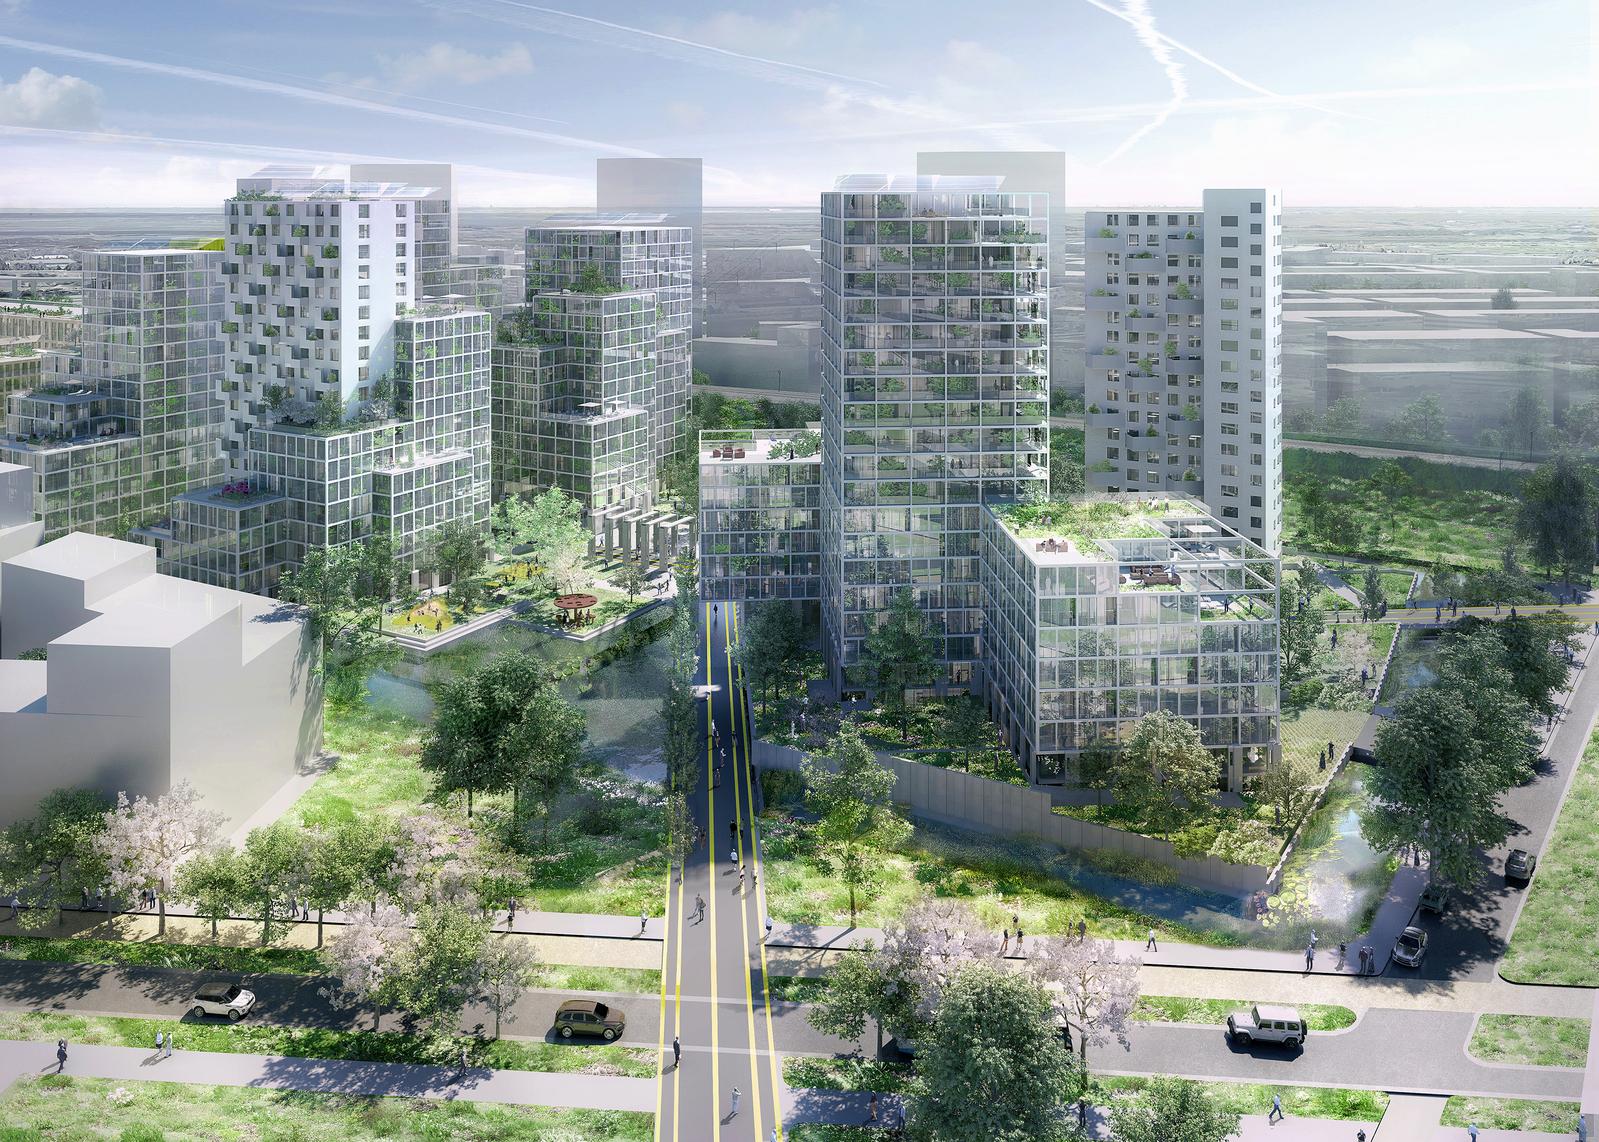 Amsterdam OMA Architectes Prison Ecologie Quartier Environnement